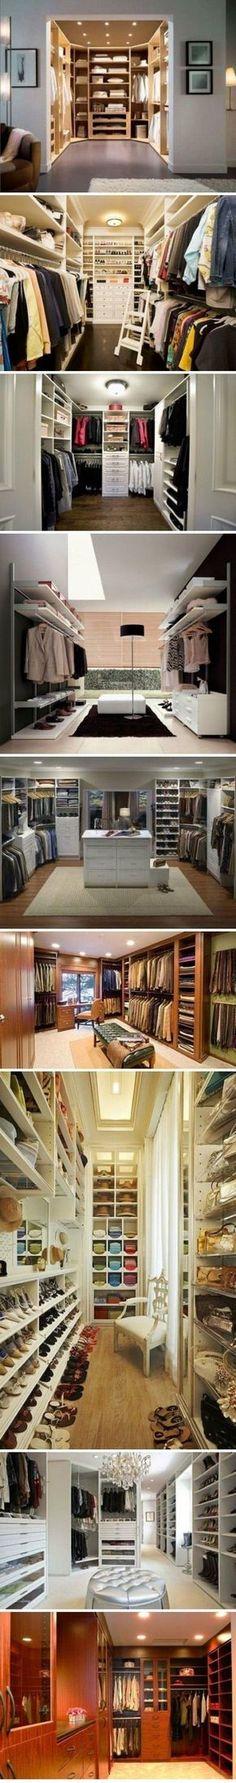 wardrobe.jpg 440×3,325 pixeles